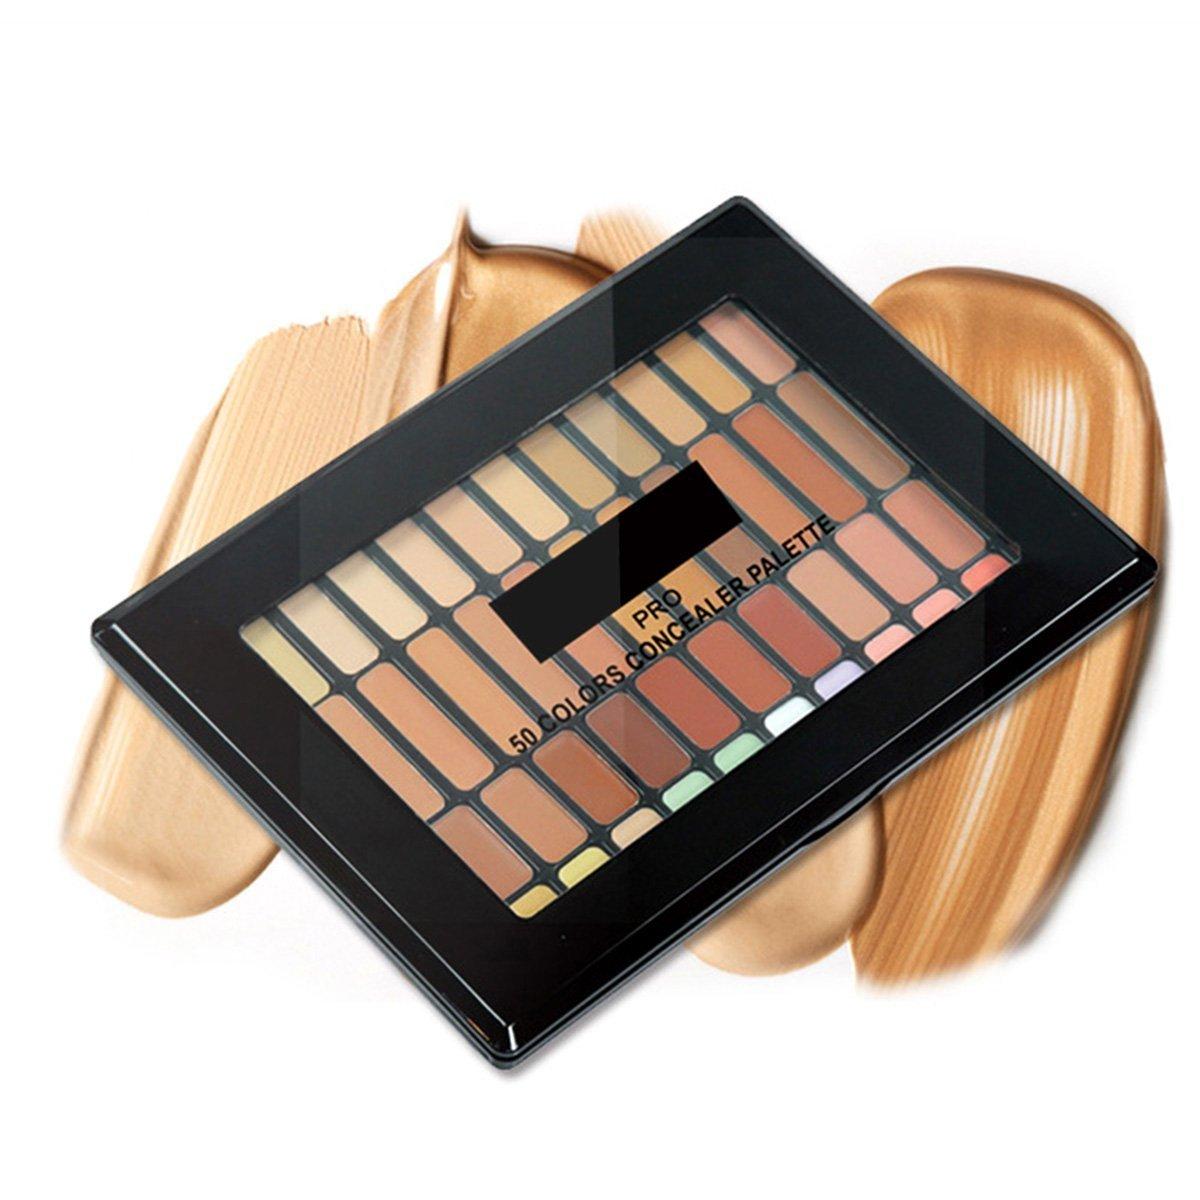 50 Color Concealer Palette - ELVASEN Professional Women Makeup Cosmetic Foundation Contour Creamy Highlighter Camouflage Kit